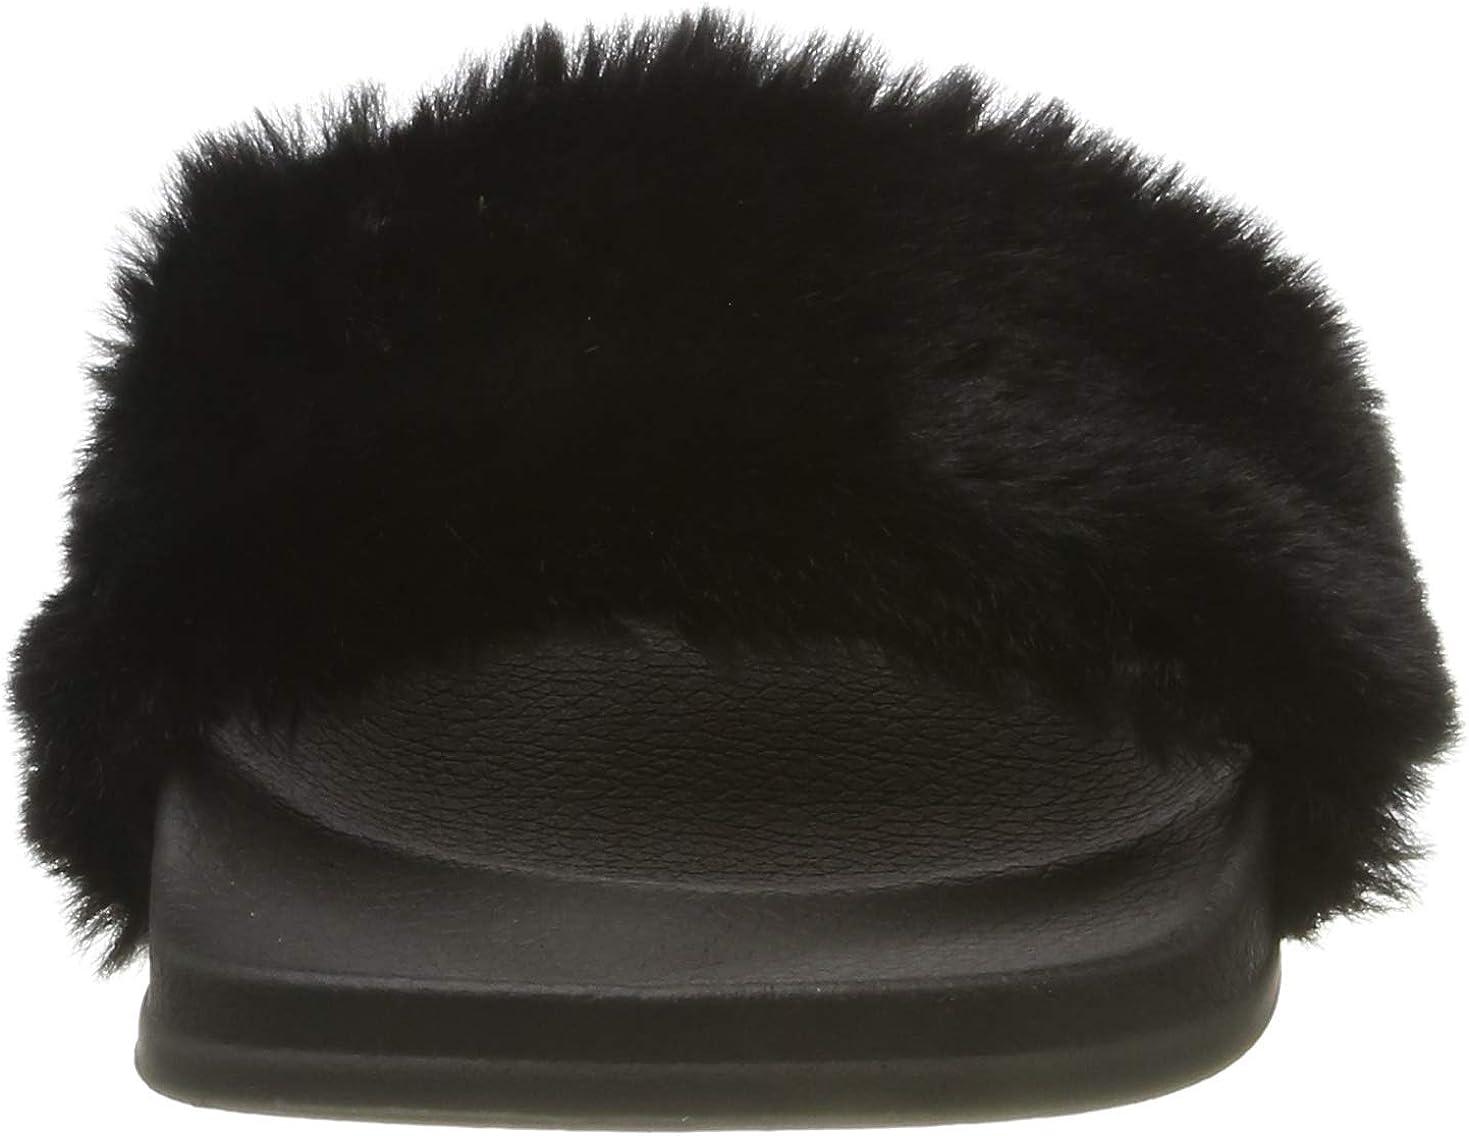 APIKA Femmes Flip Flop Faux Fourrure Slipper Fuzzy Fluffy Comfy Sliders Open Toe Slip sur